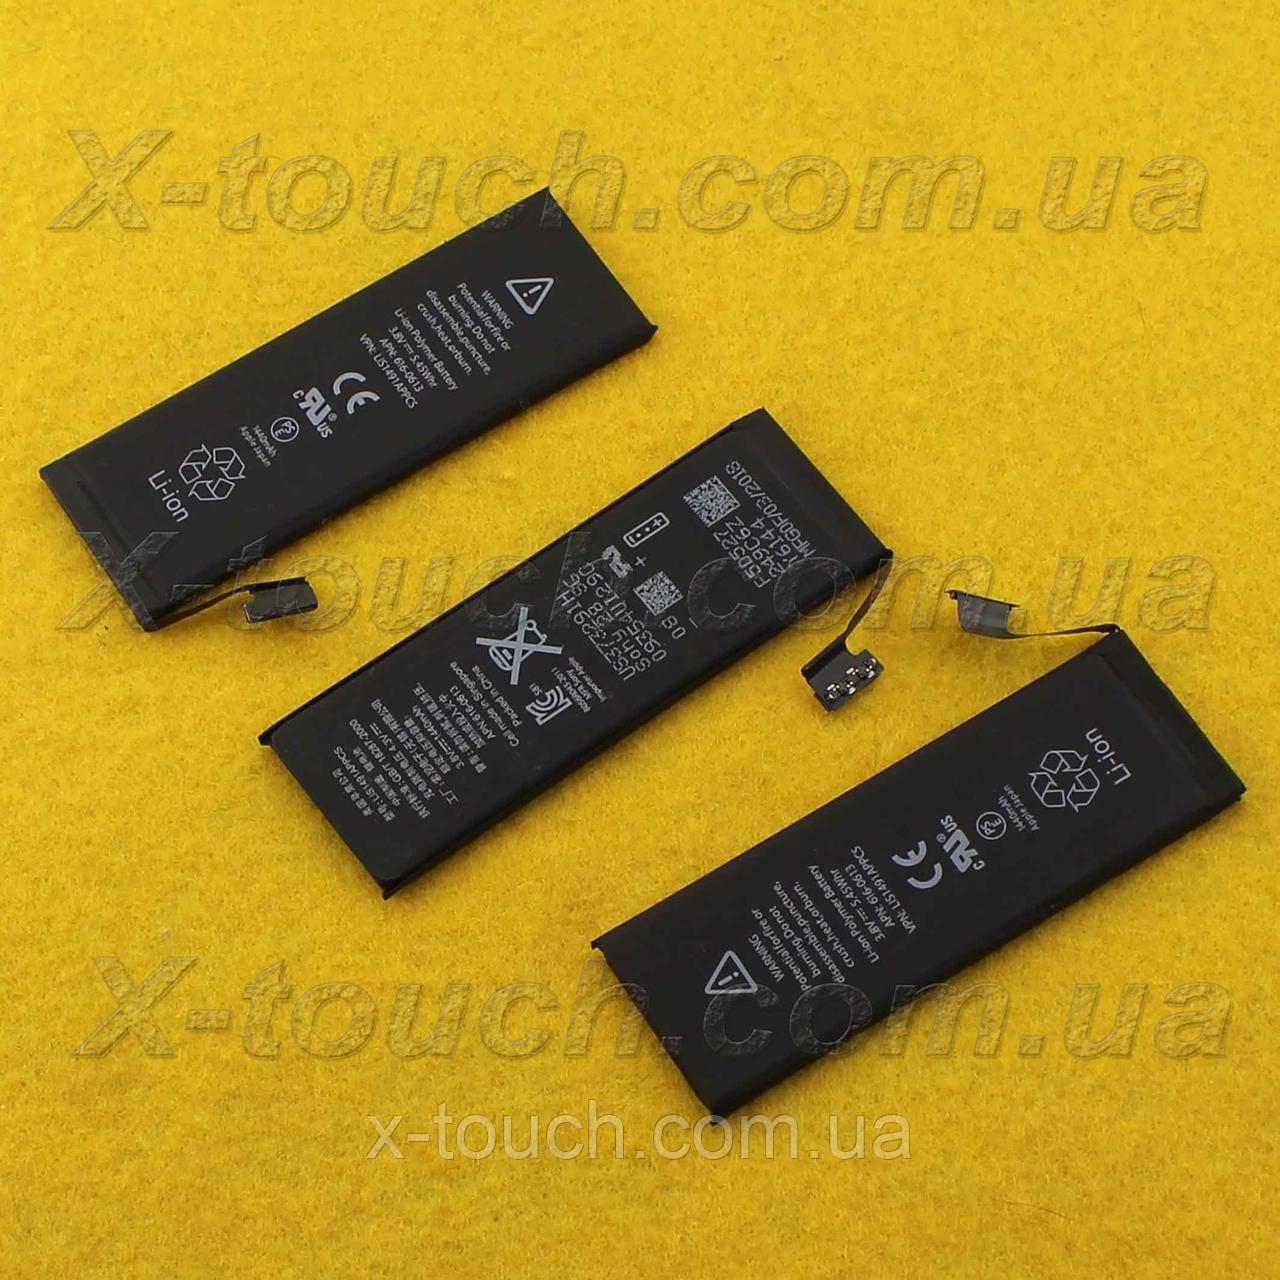 Аккумулятор, батарея для телефона iPhone 5